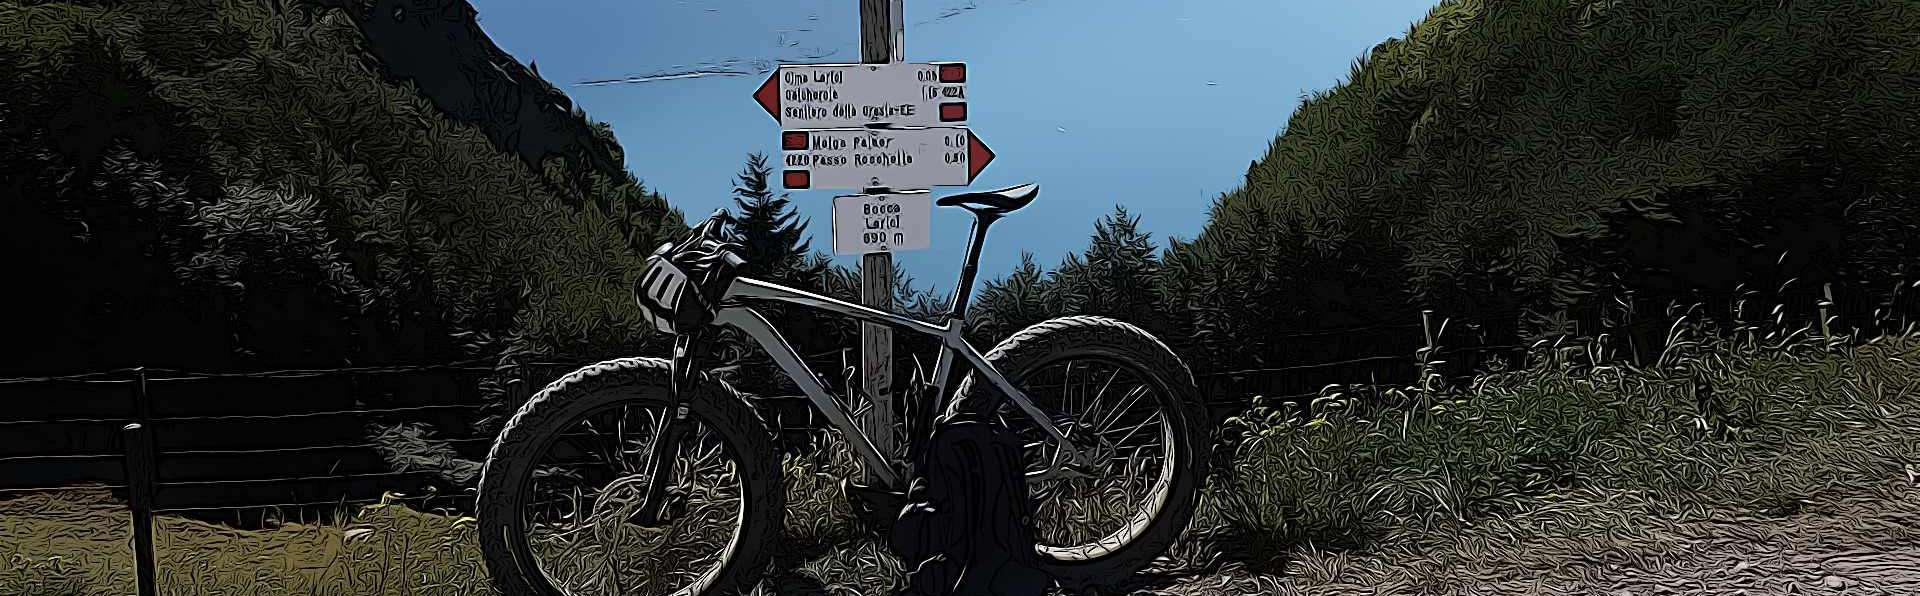 Cycling at Lake Garda - Bike Trails in the Veneto